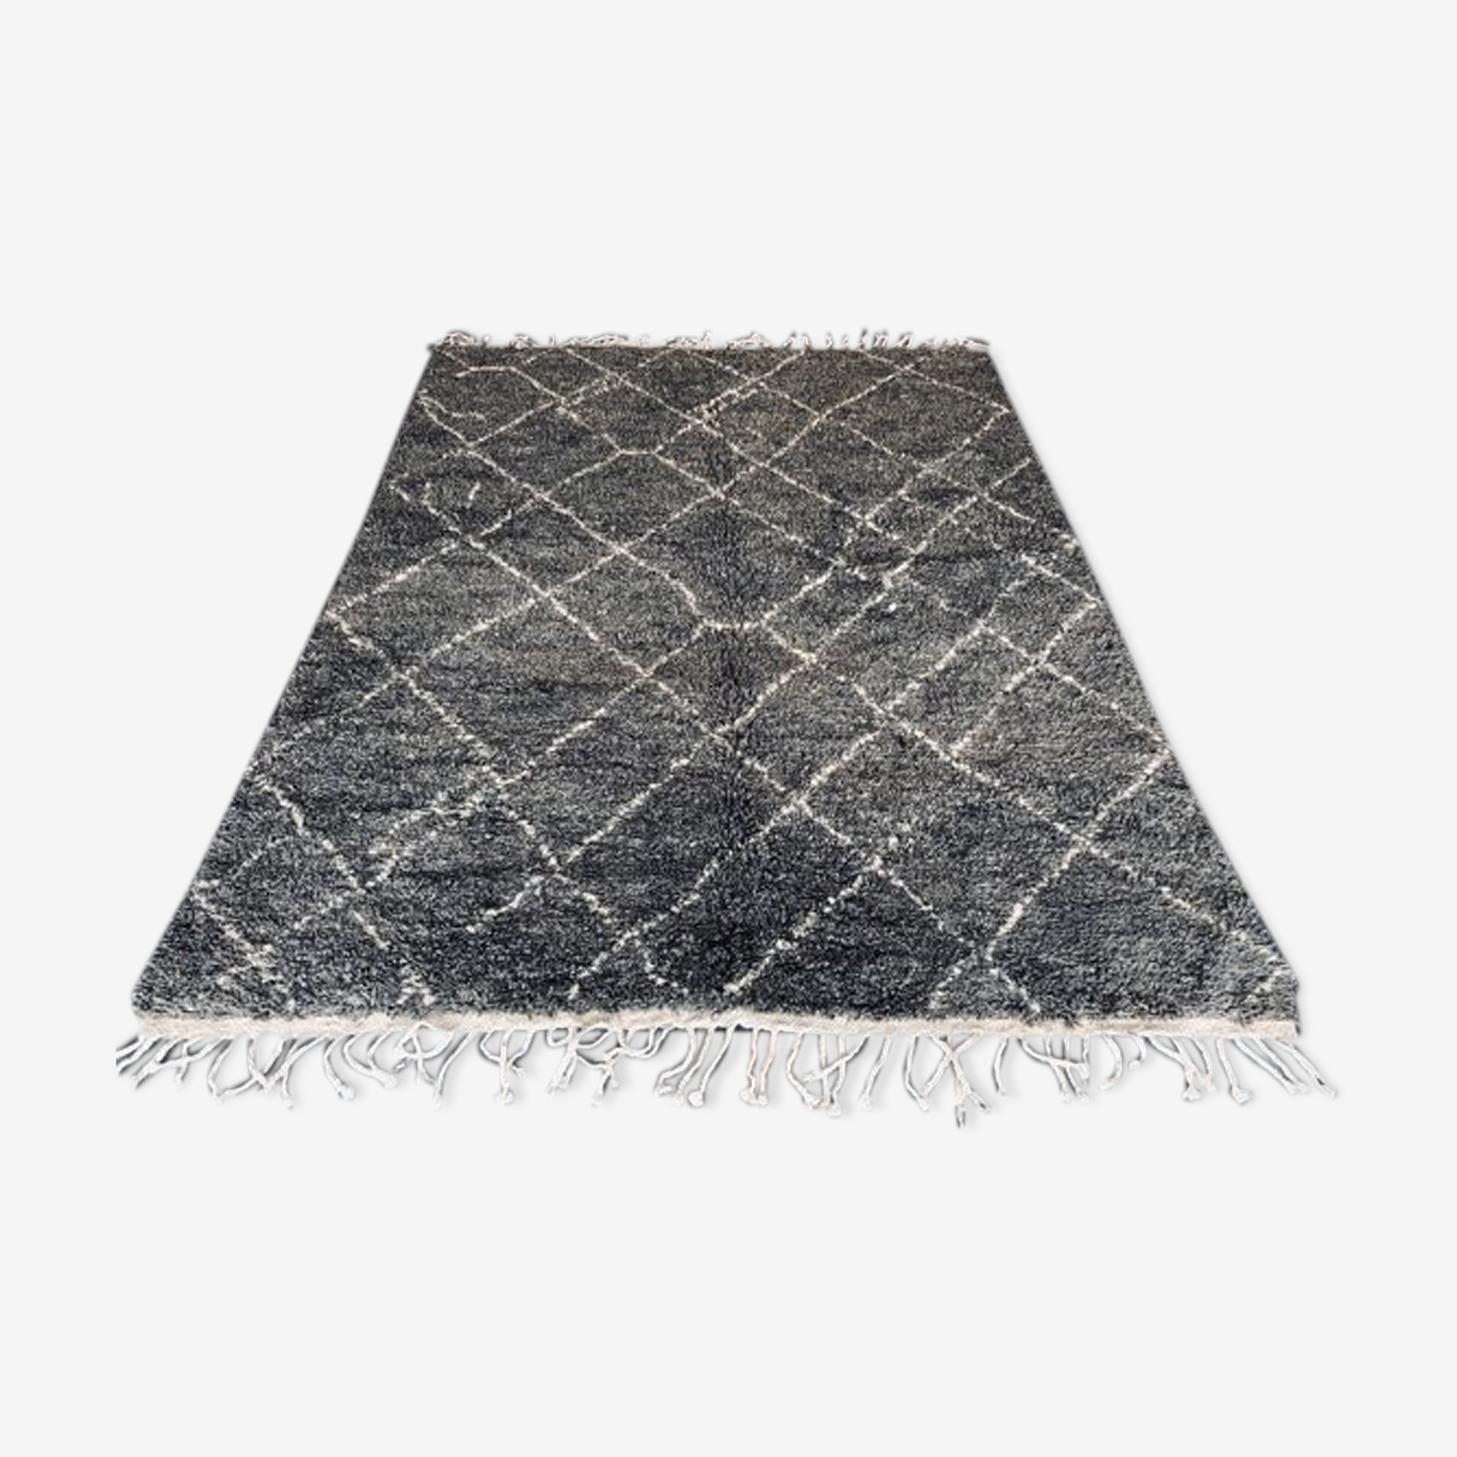 Carpet berber beni ourain 200x300cm